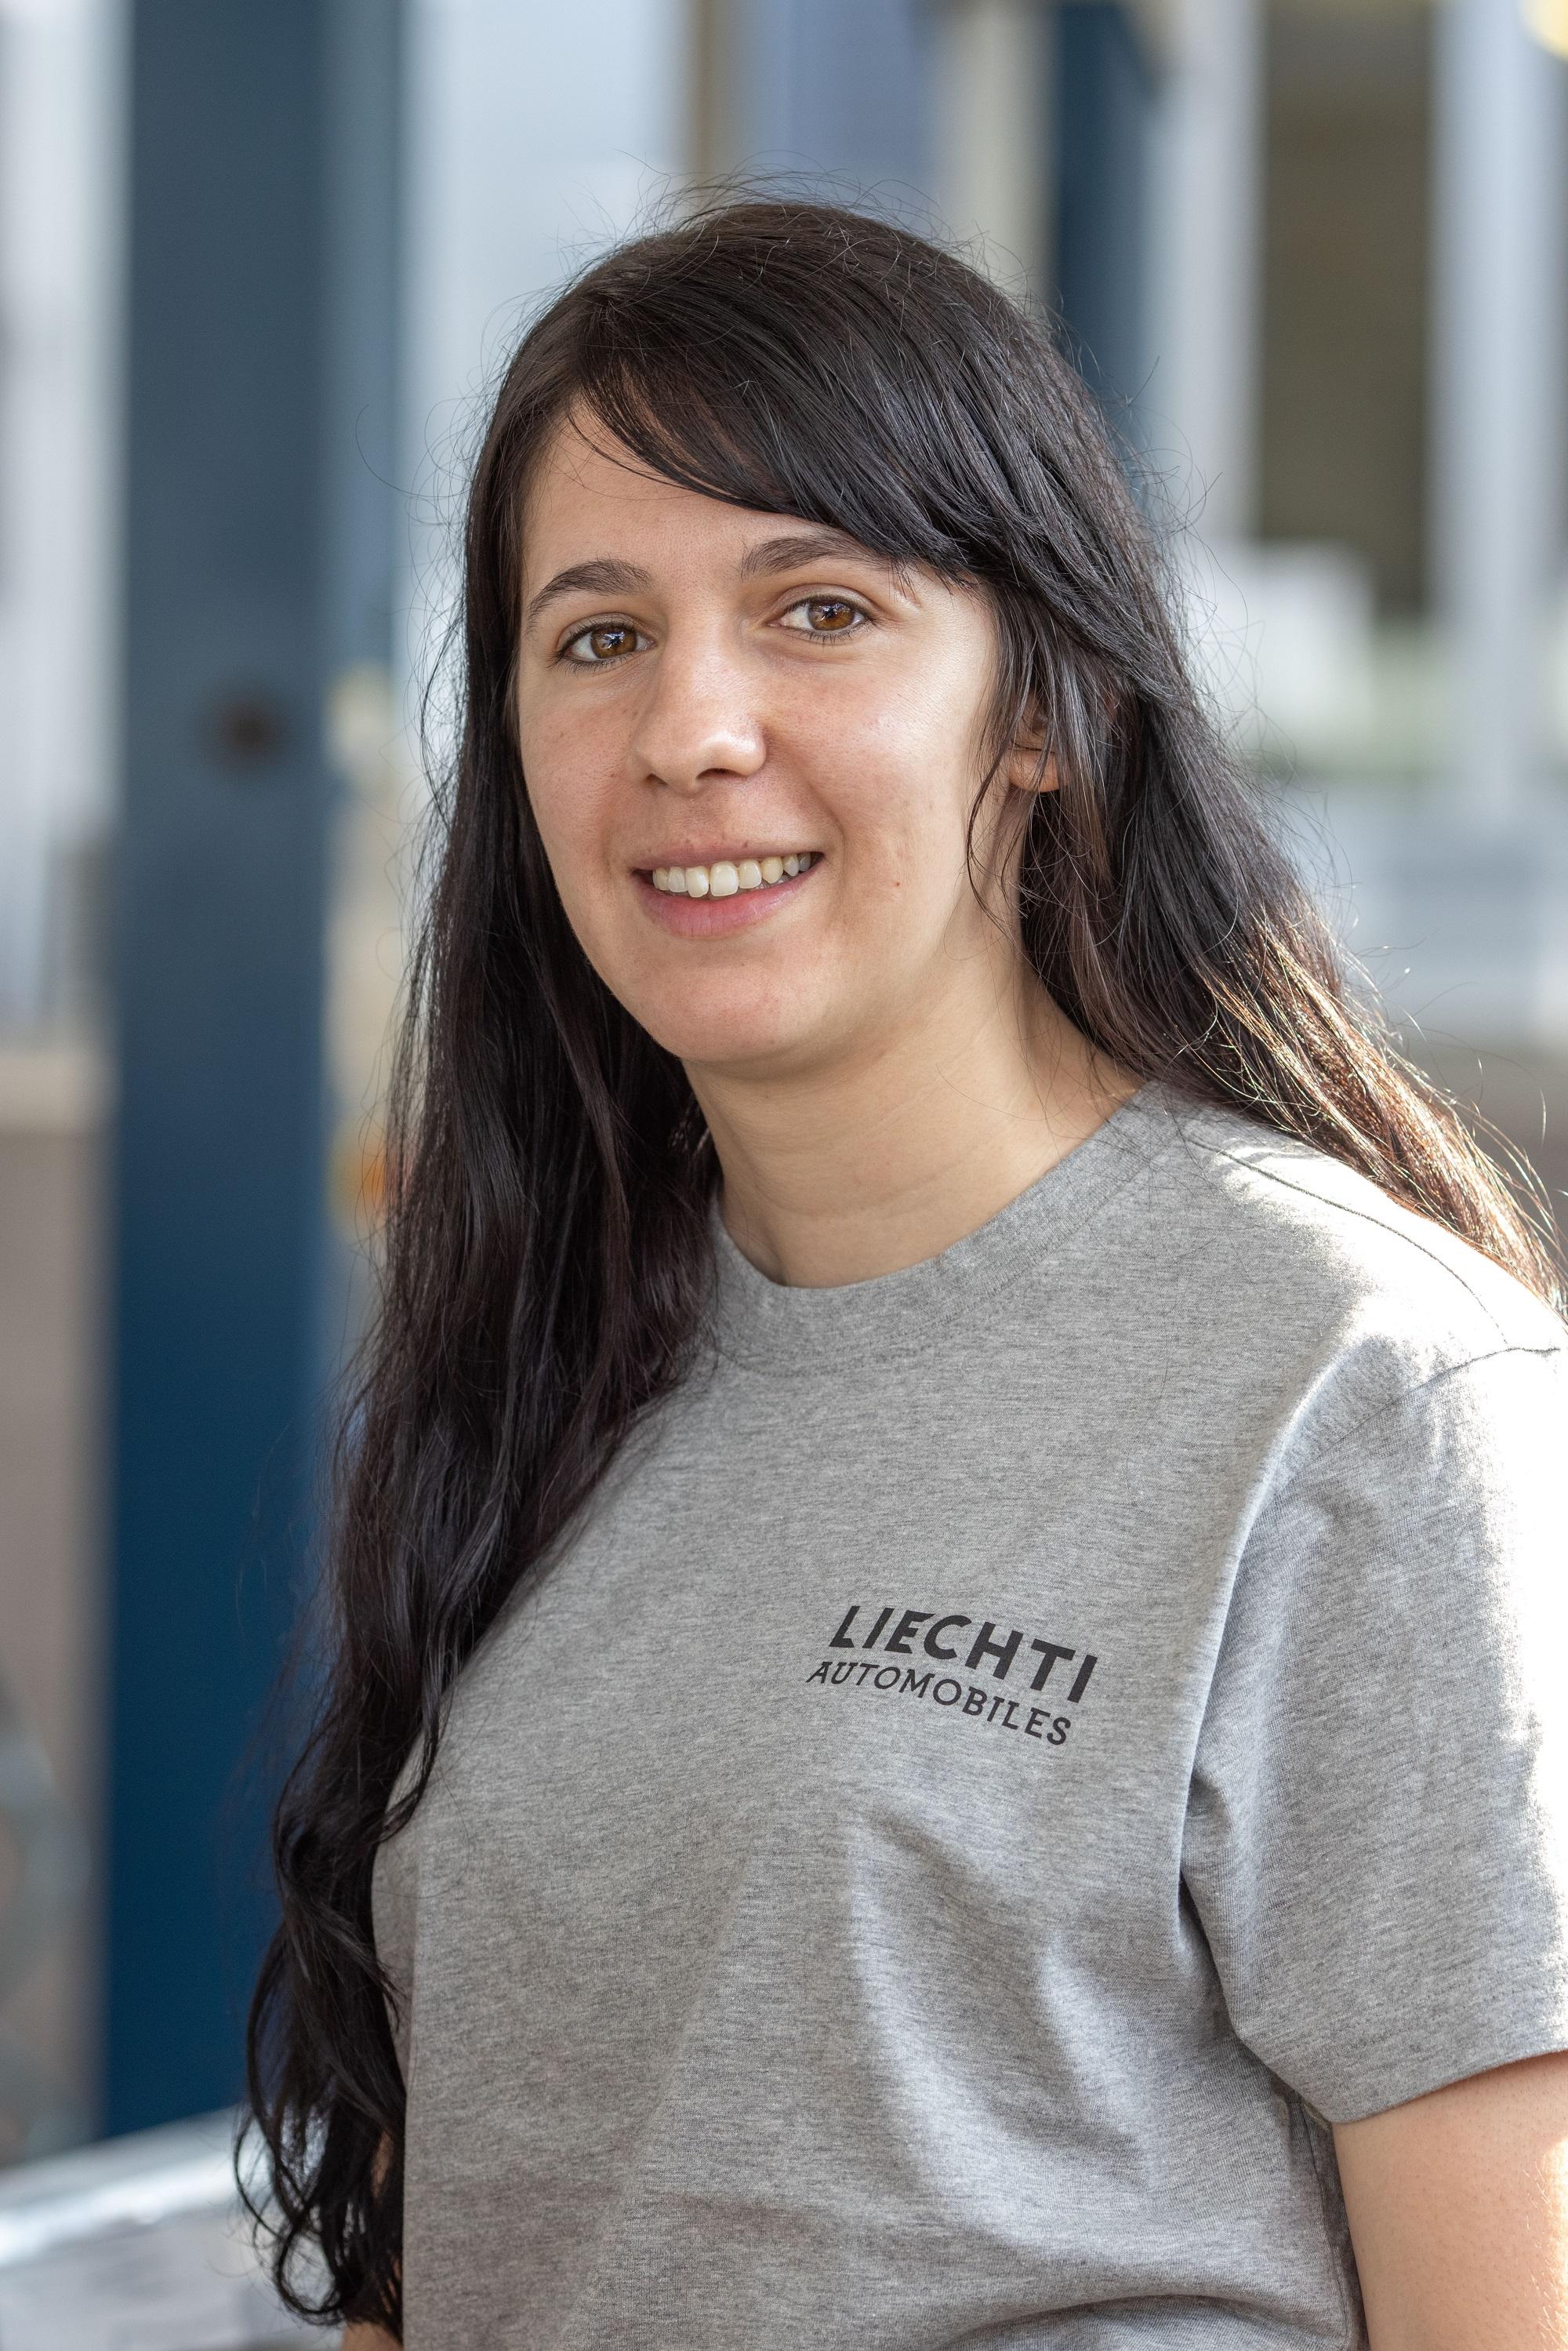 liechti_team-7881_2000x3000